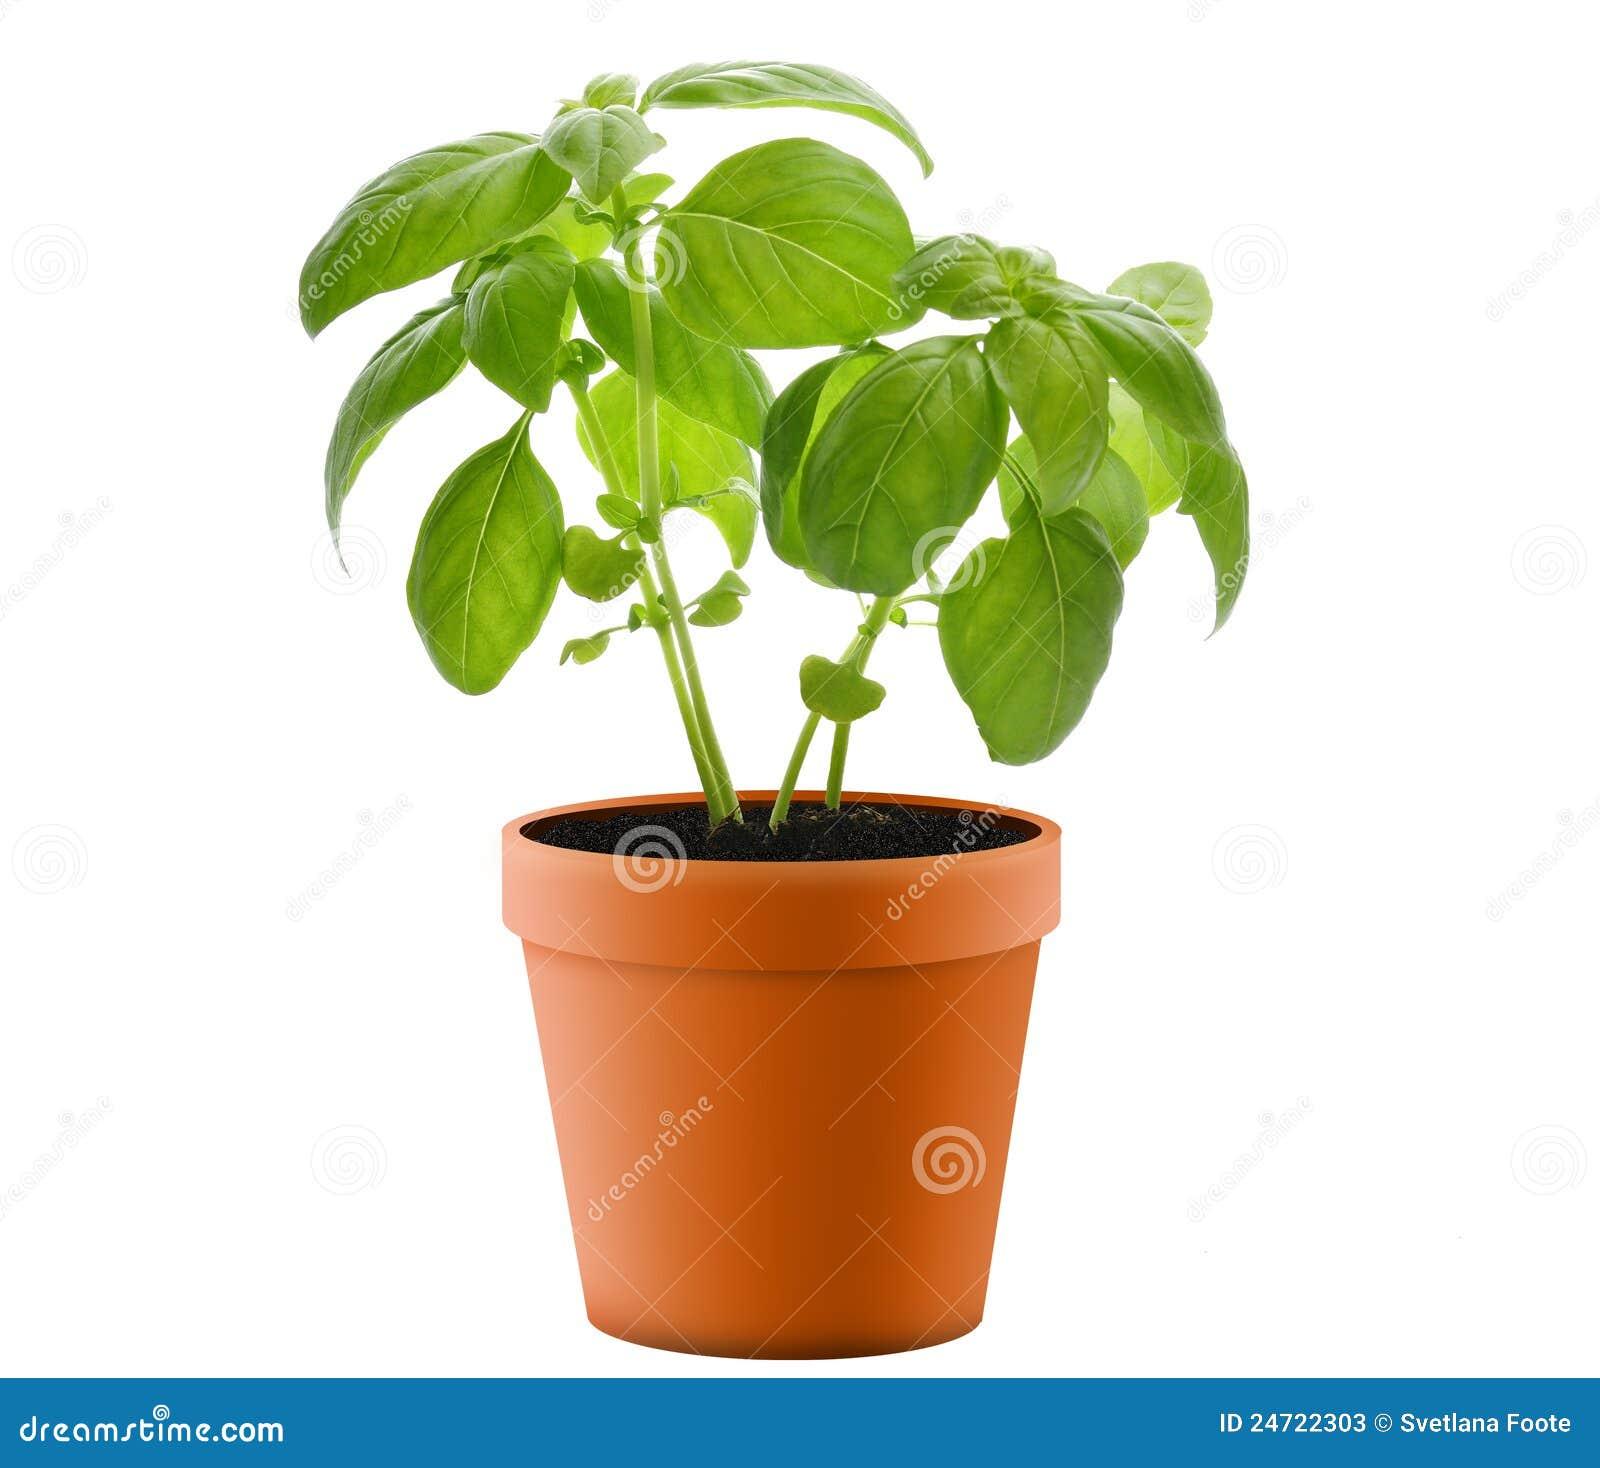 basil plant in a pot stock photos image 24722303. Black Bedroom Furniture Sets. Home Design Ideas